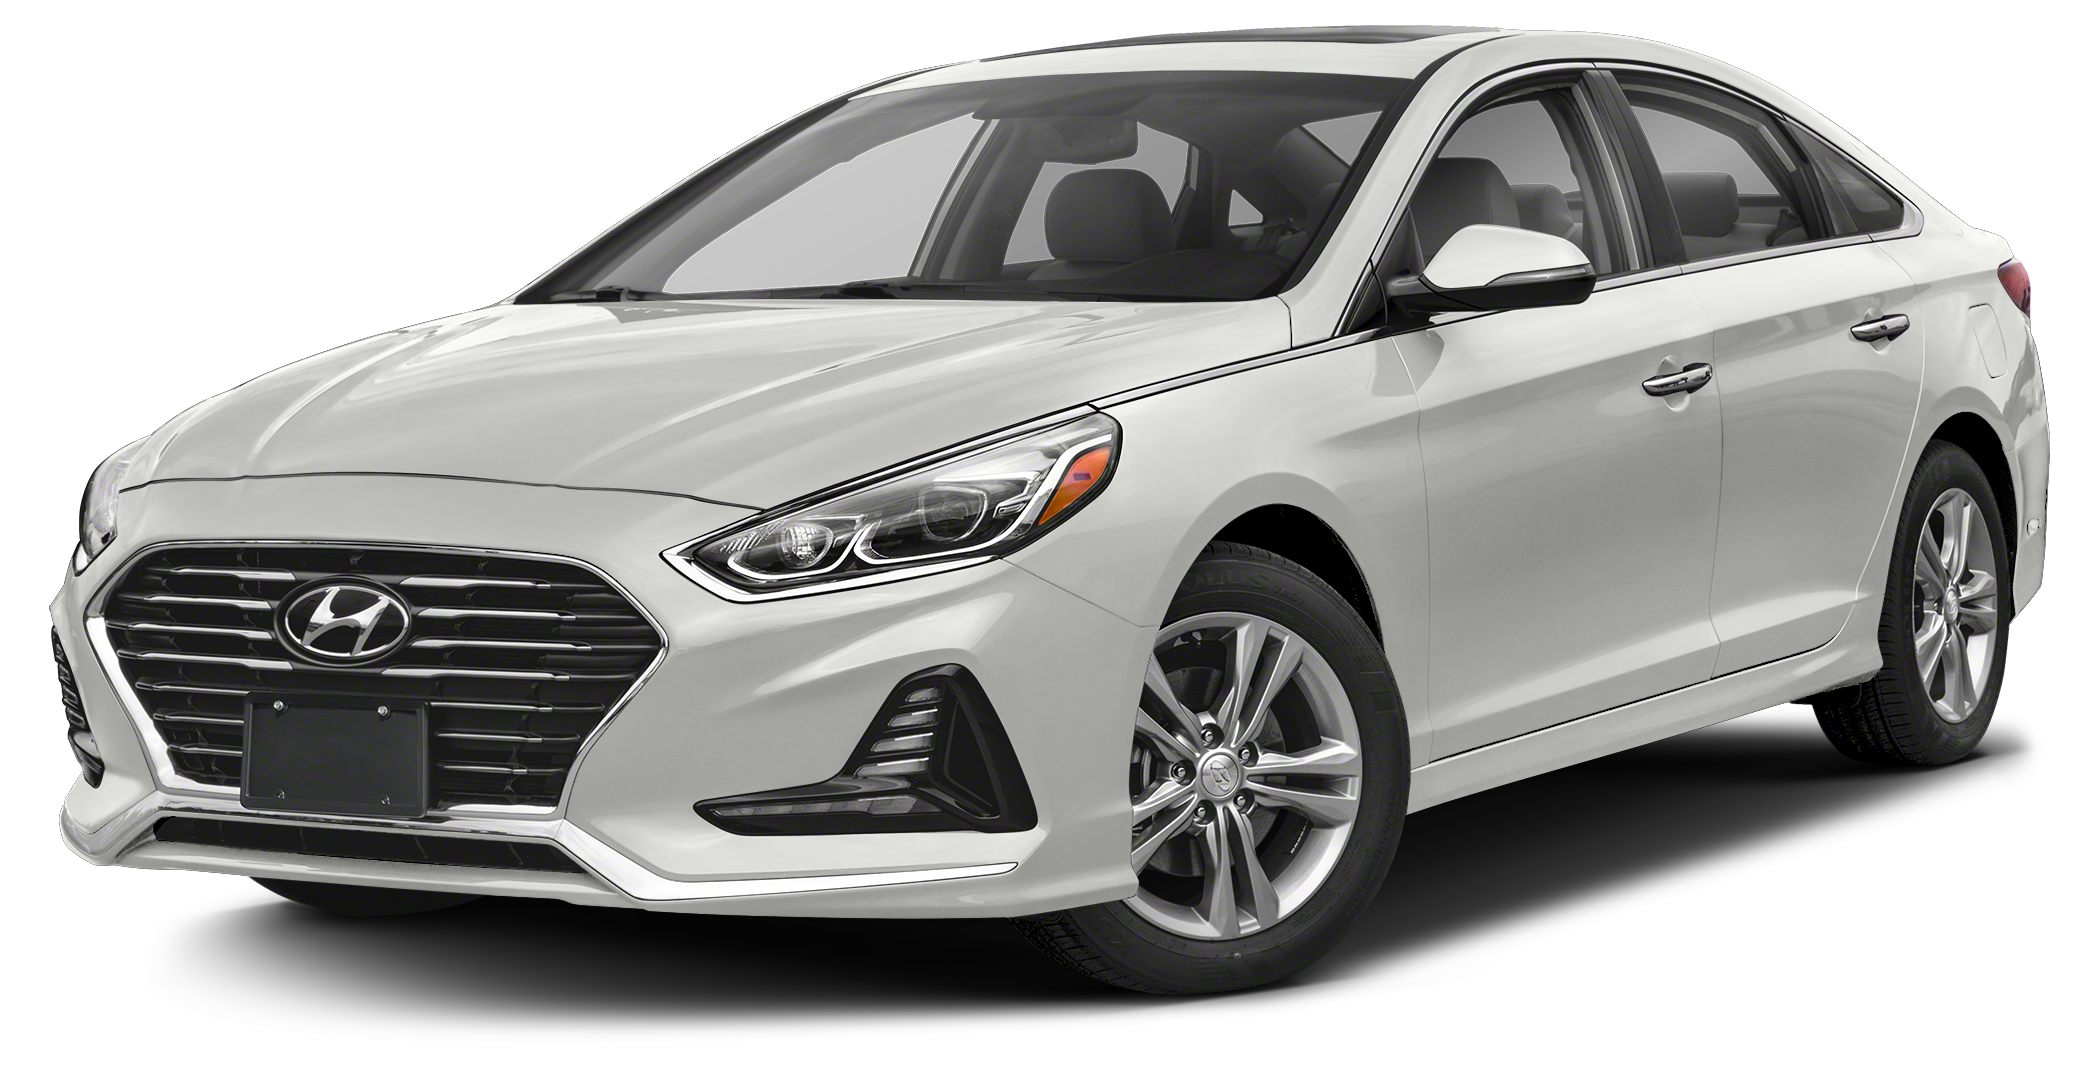 2018 Hyundai Sonata Limited Price includes 500 - Military Program Exp 01022019 1000 - Ube